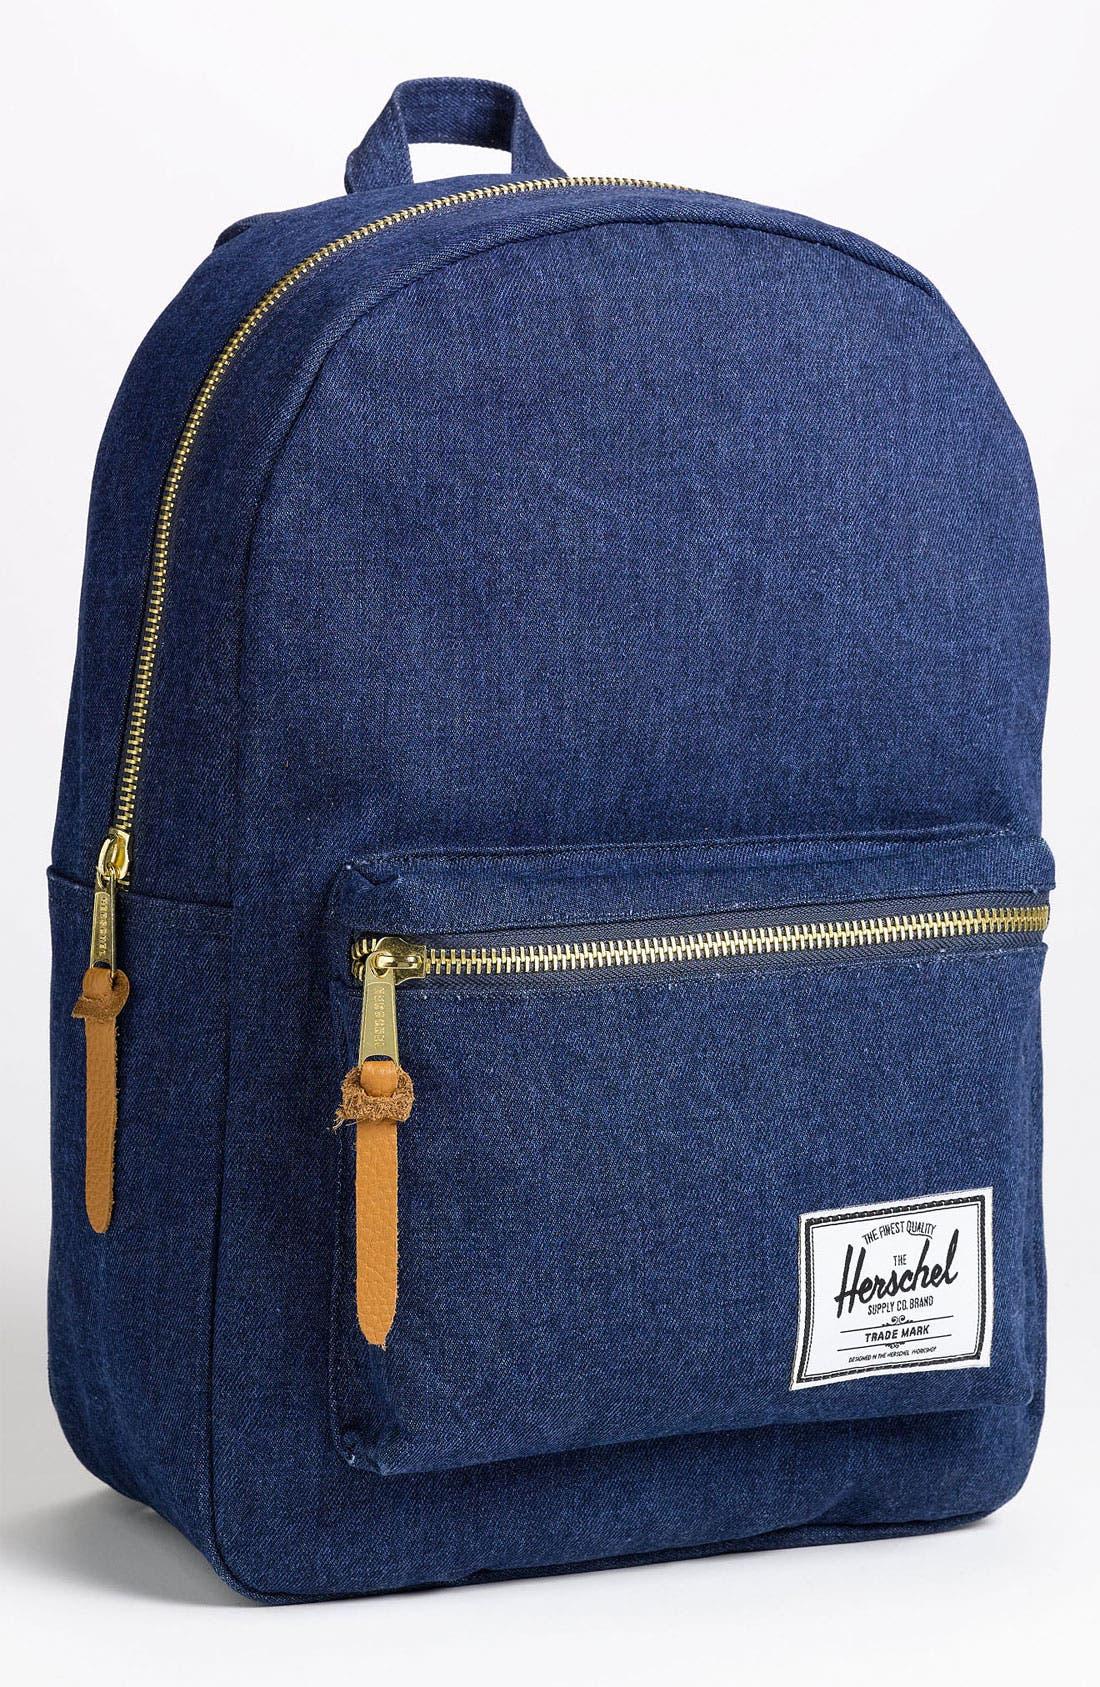 Alternate Image 1 Selected - Herschel Supply Co. 'Settlement - Denim Collection' Backpack